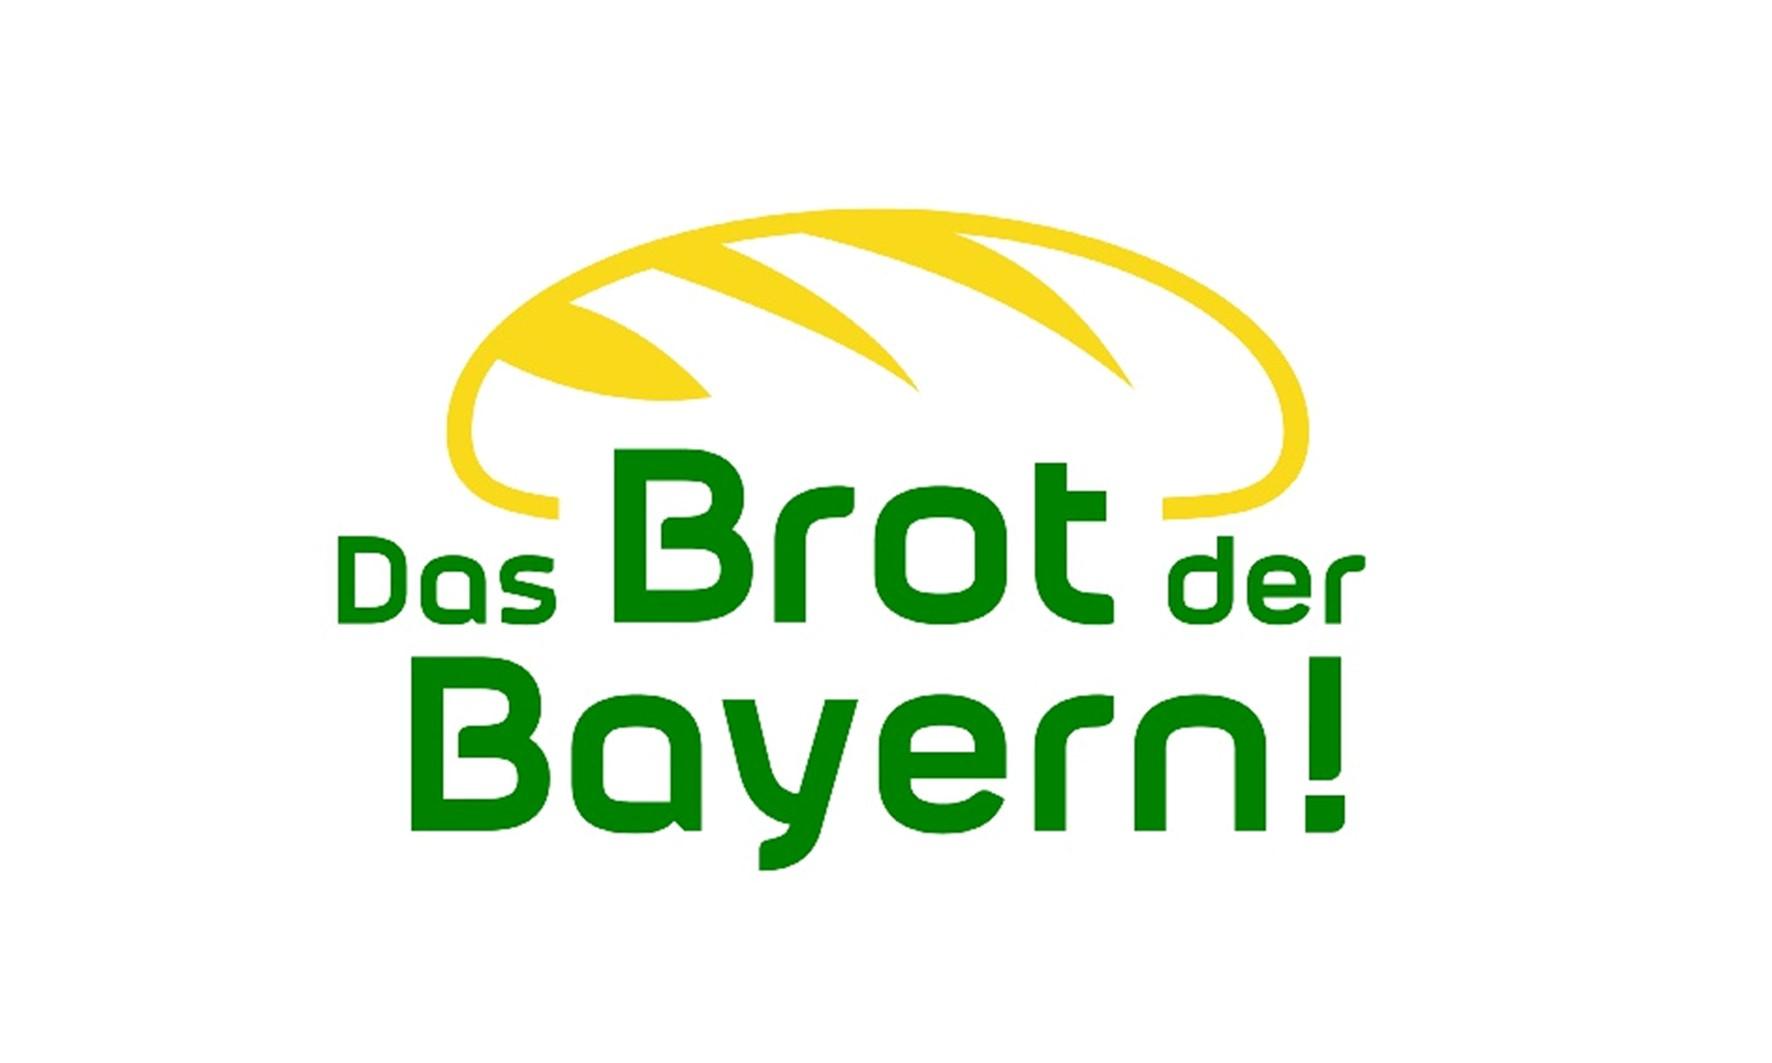 Brot der Bayern